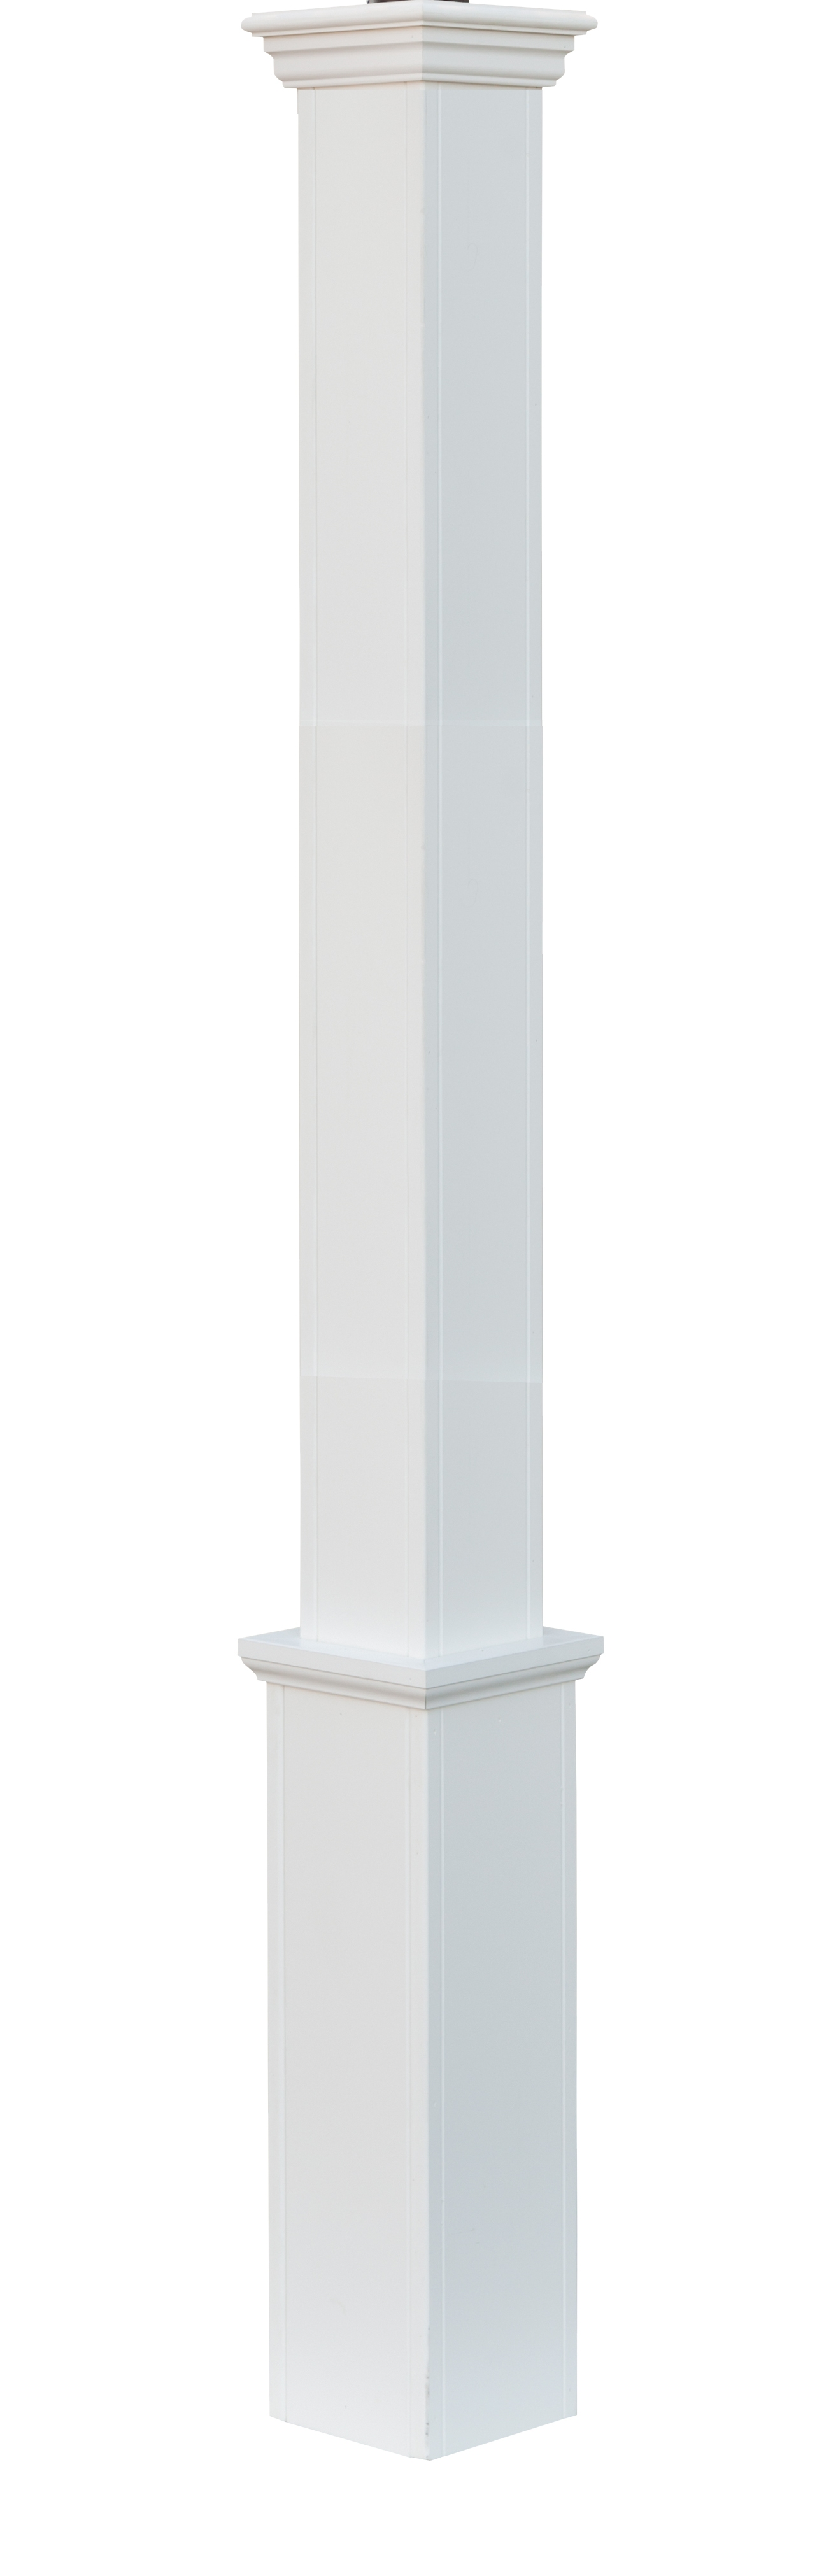 frankfort lantern post